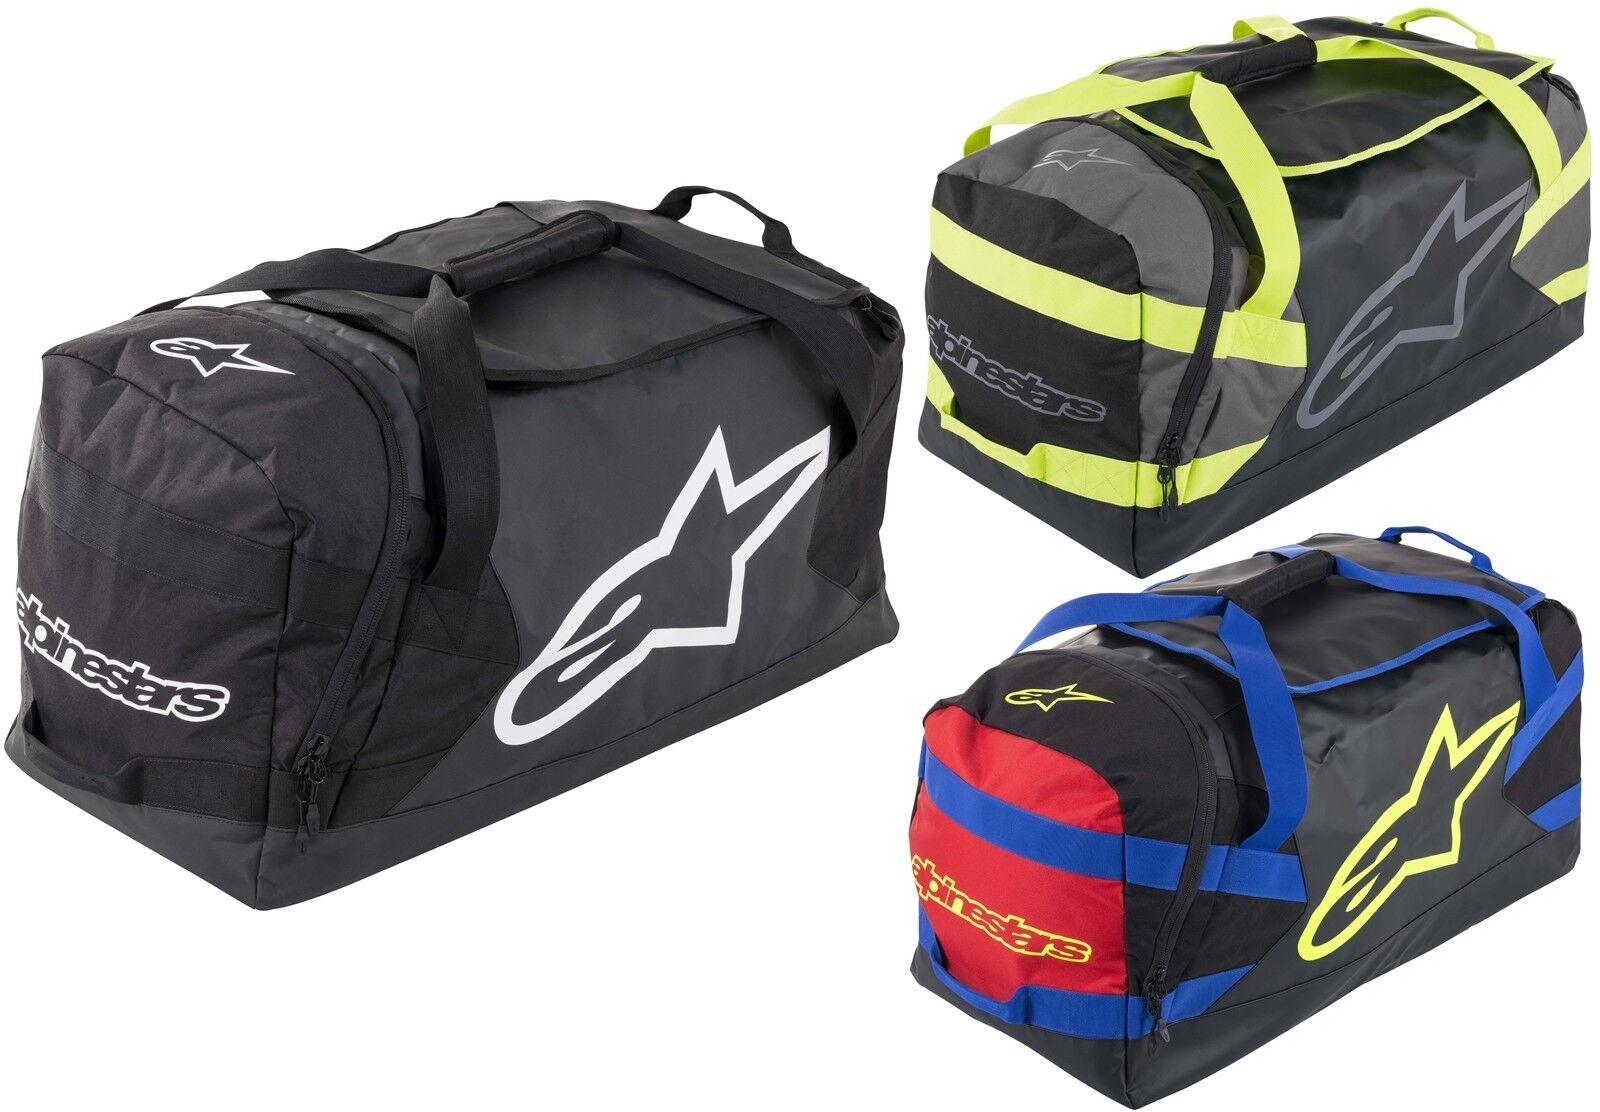 Alpinestars Goanna Borsa Sportiva per Moto Sport Tempo  Libero  enjoy saving 30-50% off